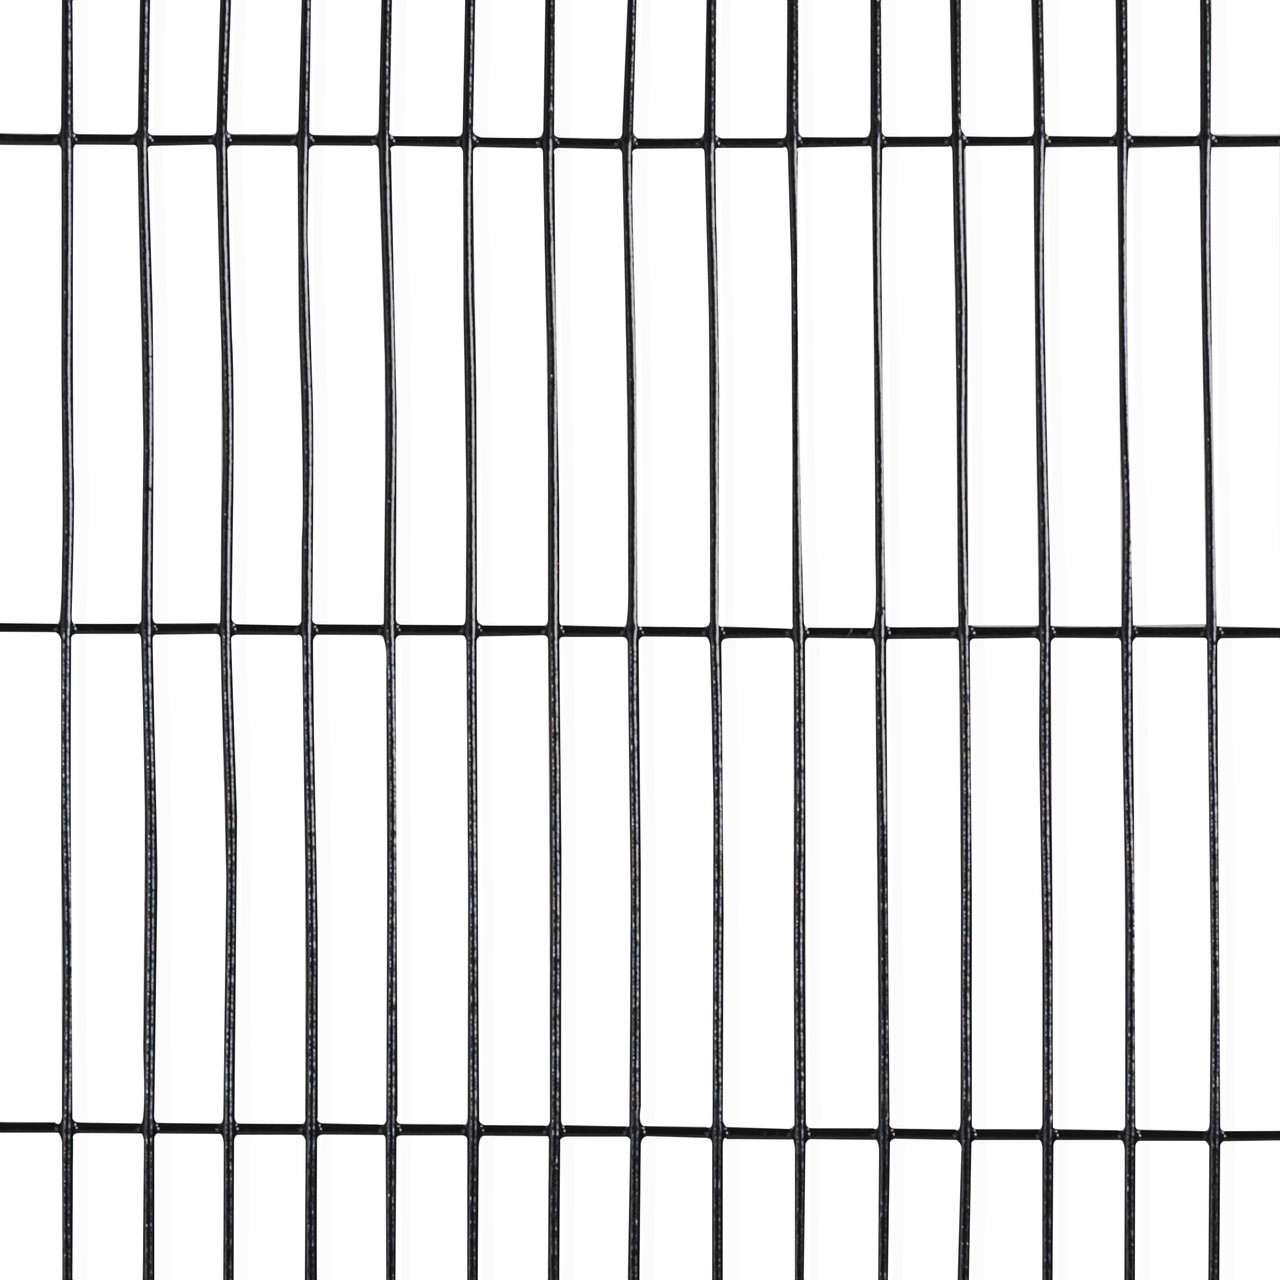 16 Gauge Black Vinyl Coated Welded Wire Mesh Size 0.5 inch by 3 ...